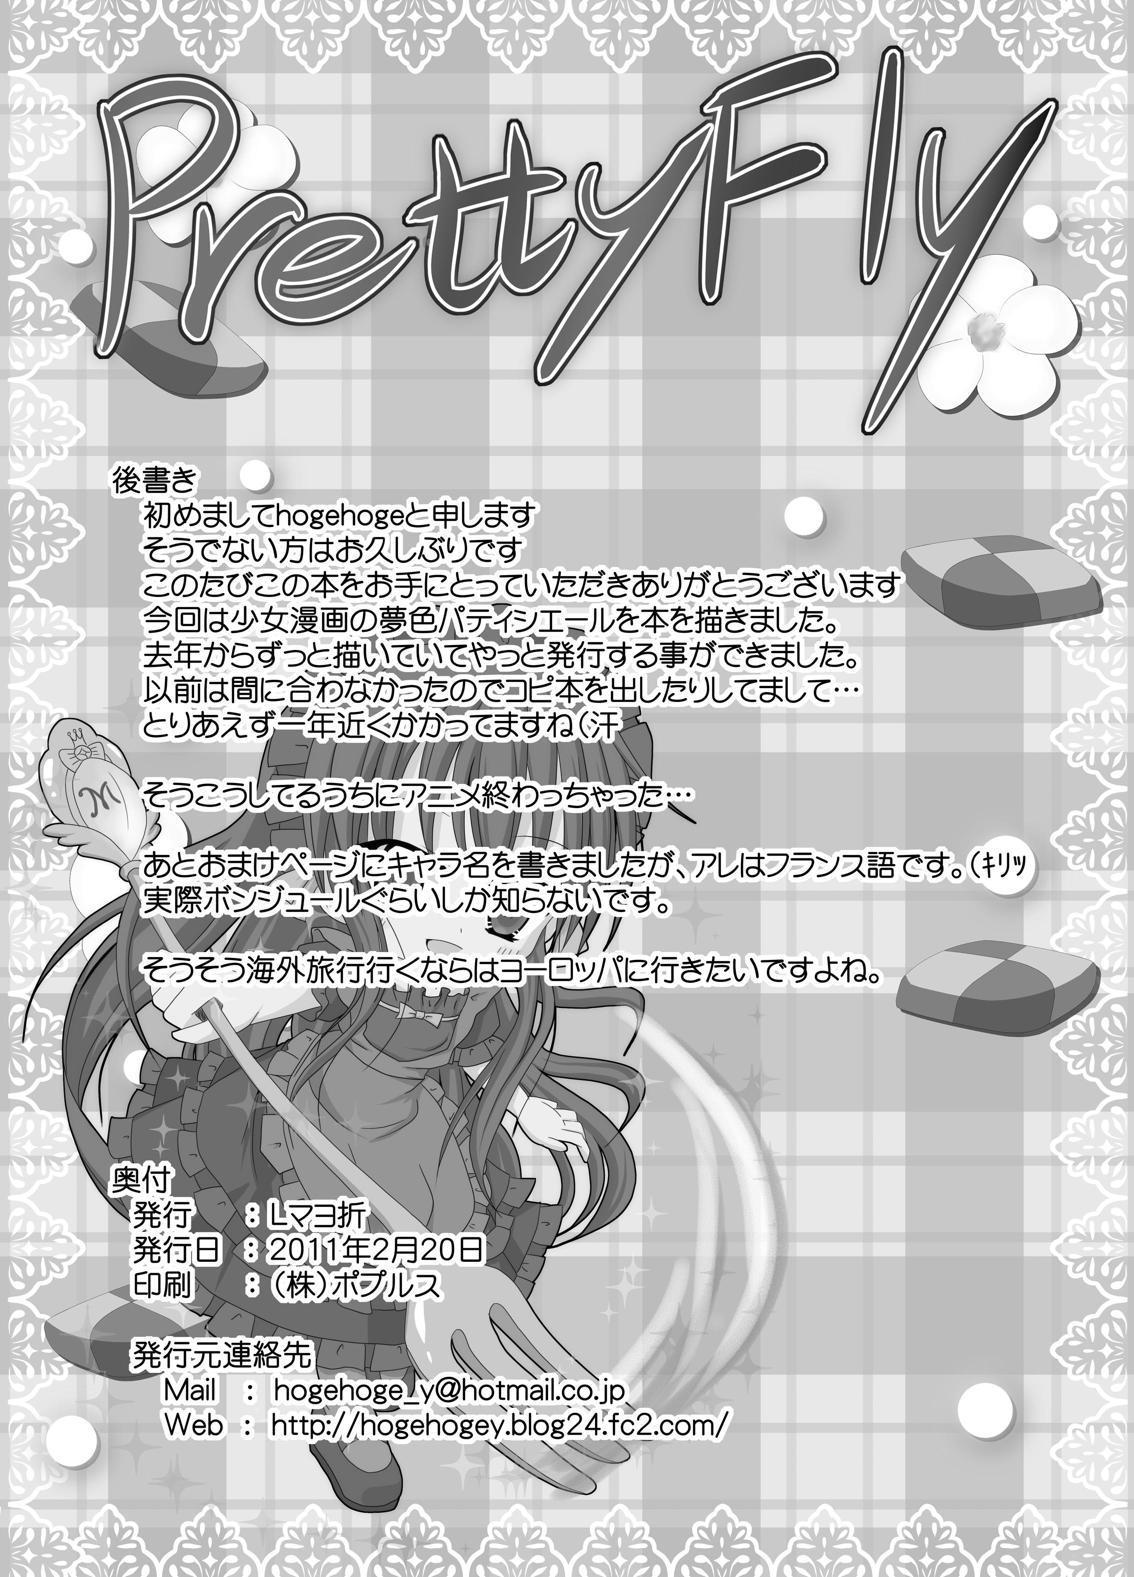 PrettyFly 24